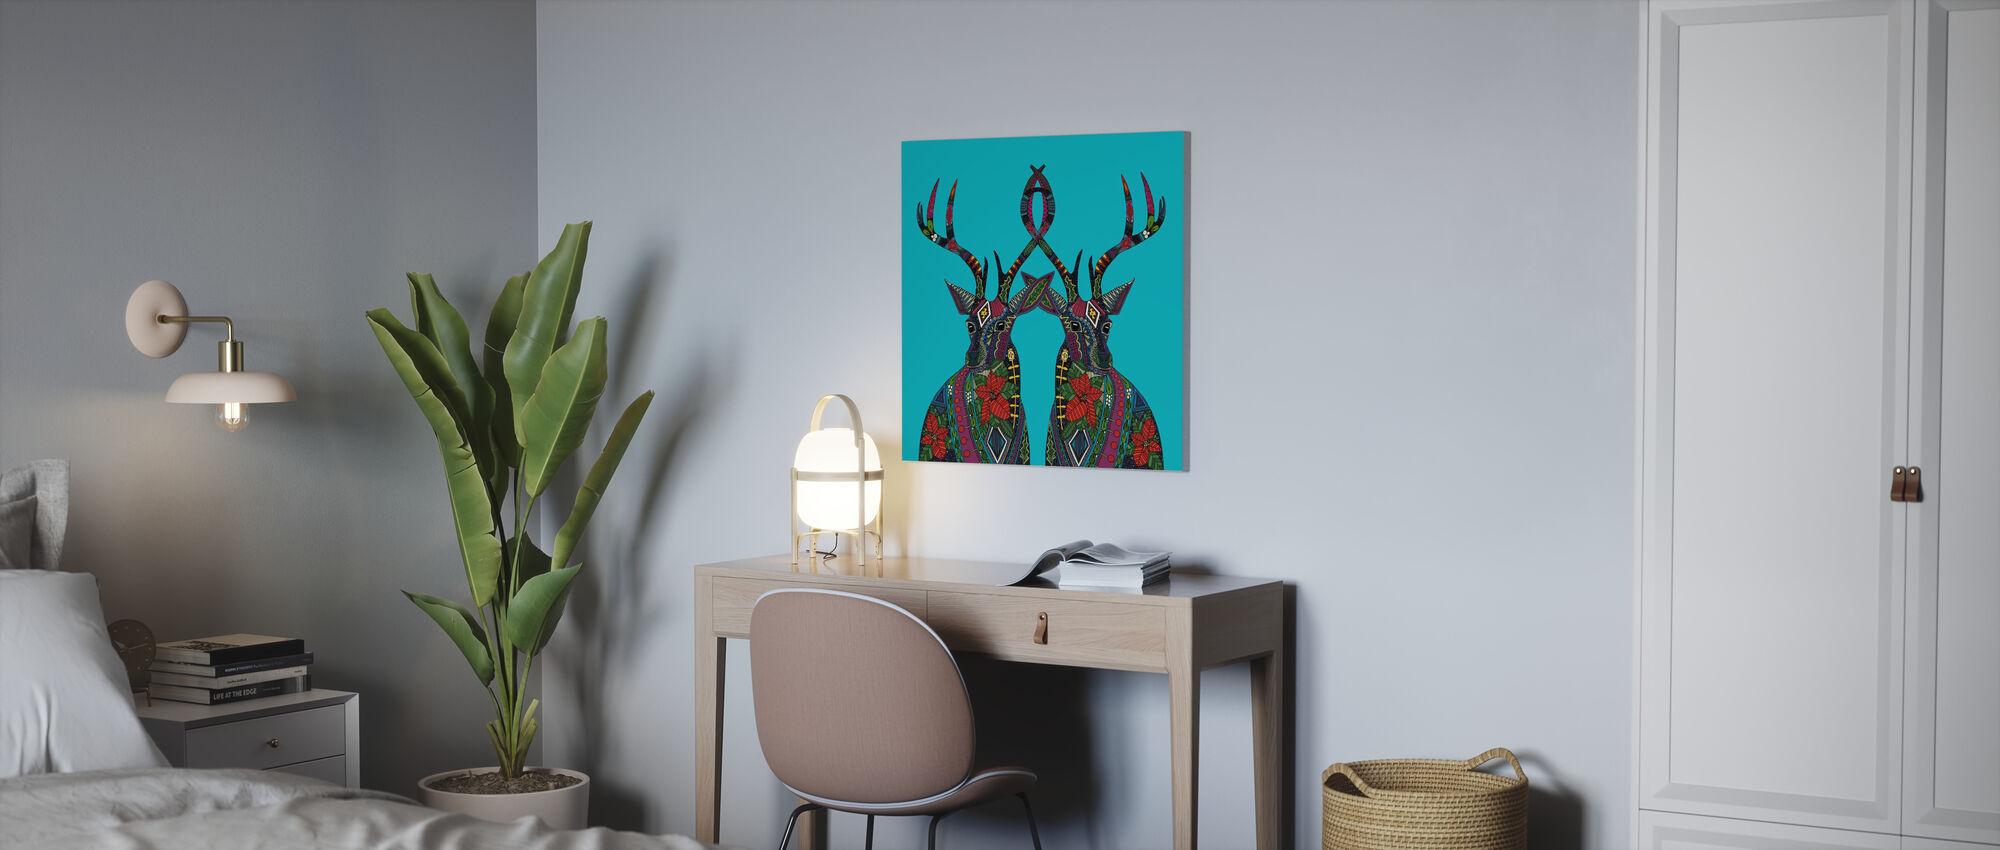 Poinsettia Deer - Canvas print - Office